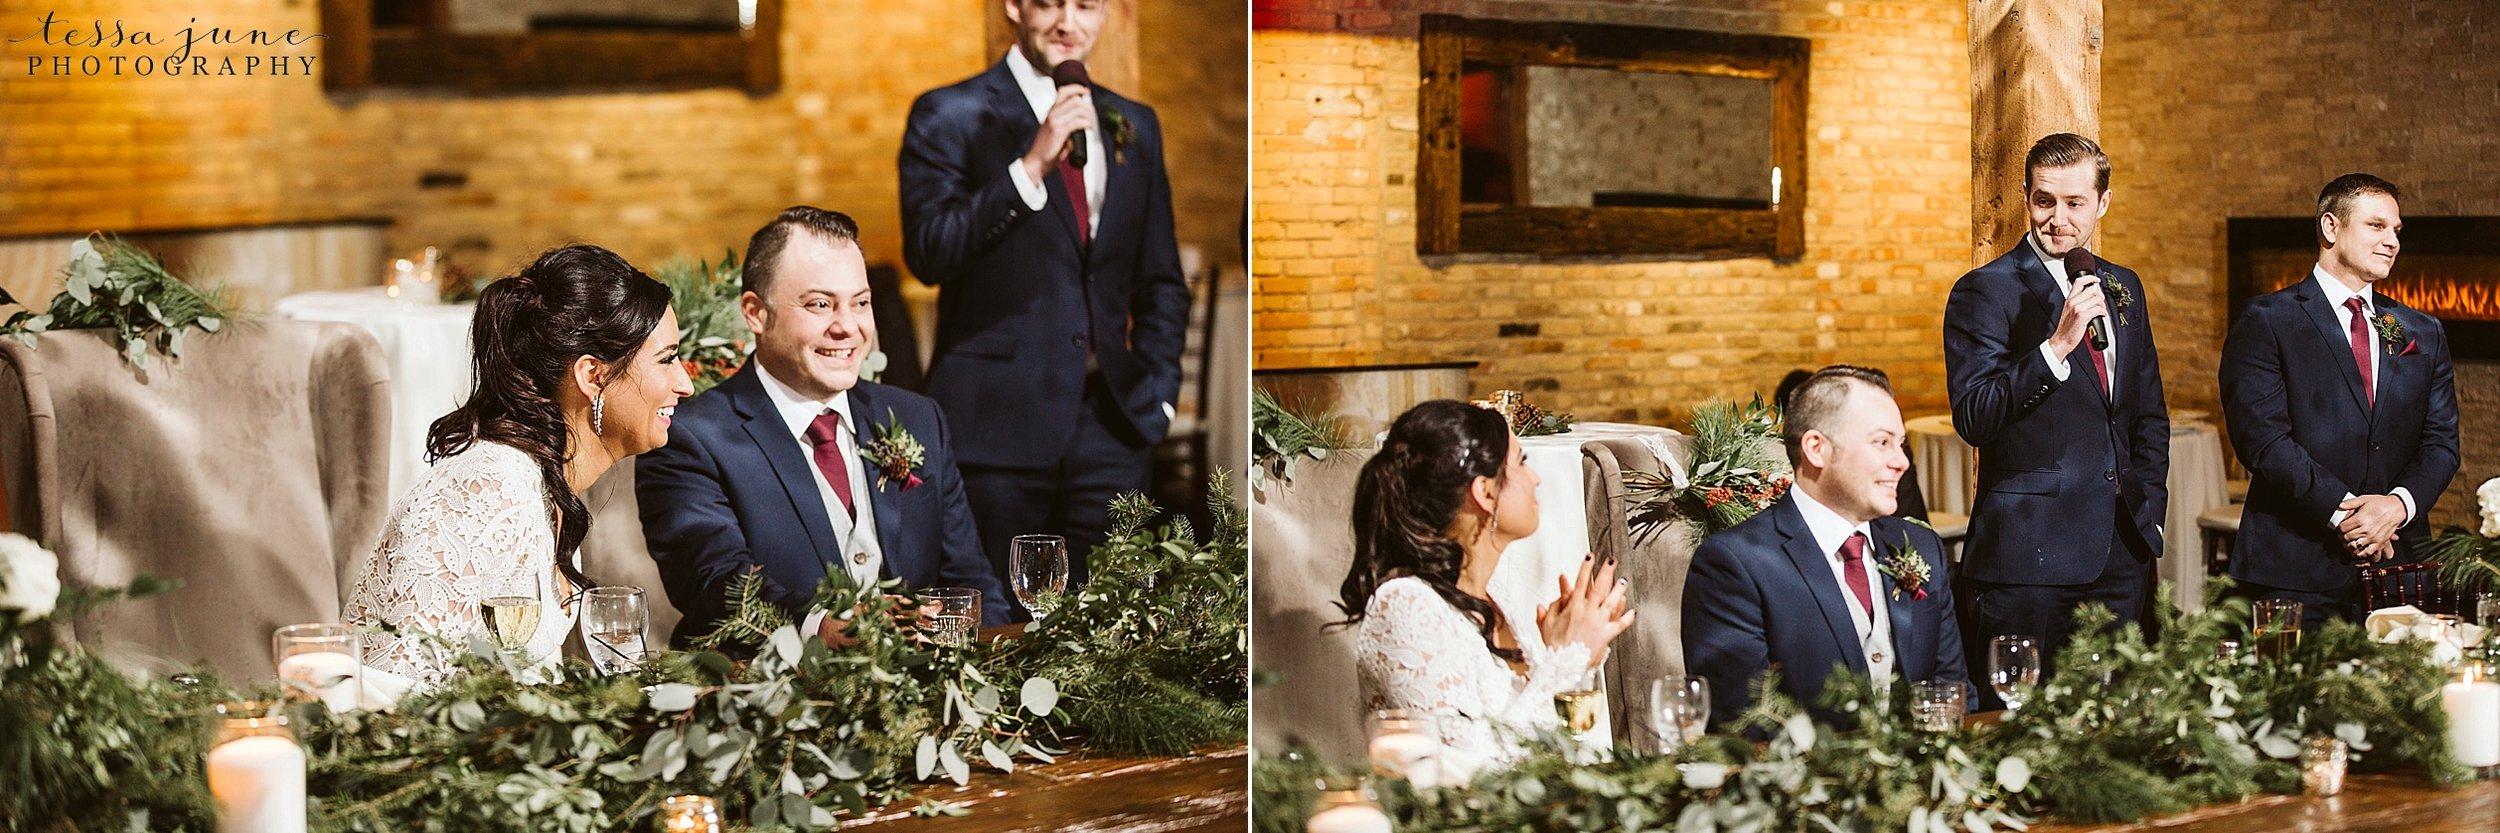 minneapolis-event-center-winter-romantic-snow-wedding-december-200.jpg